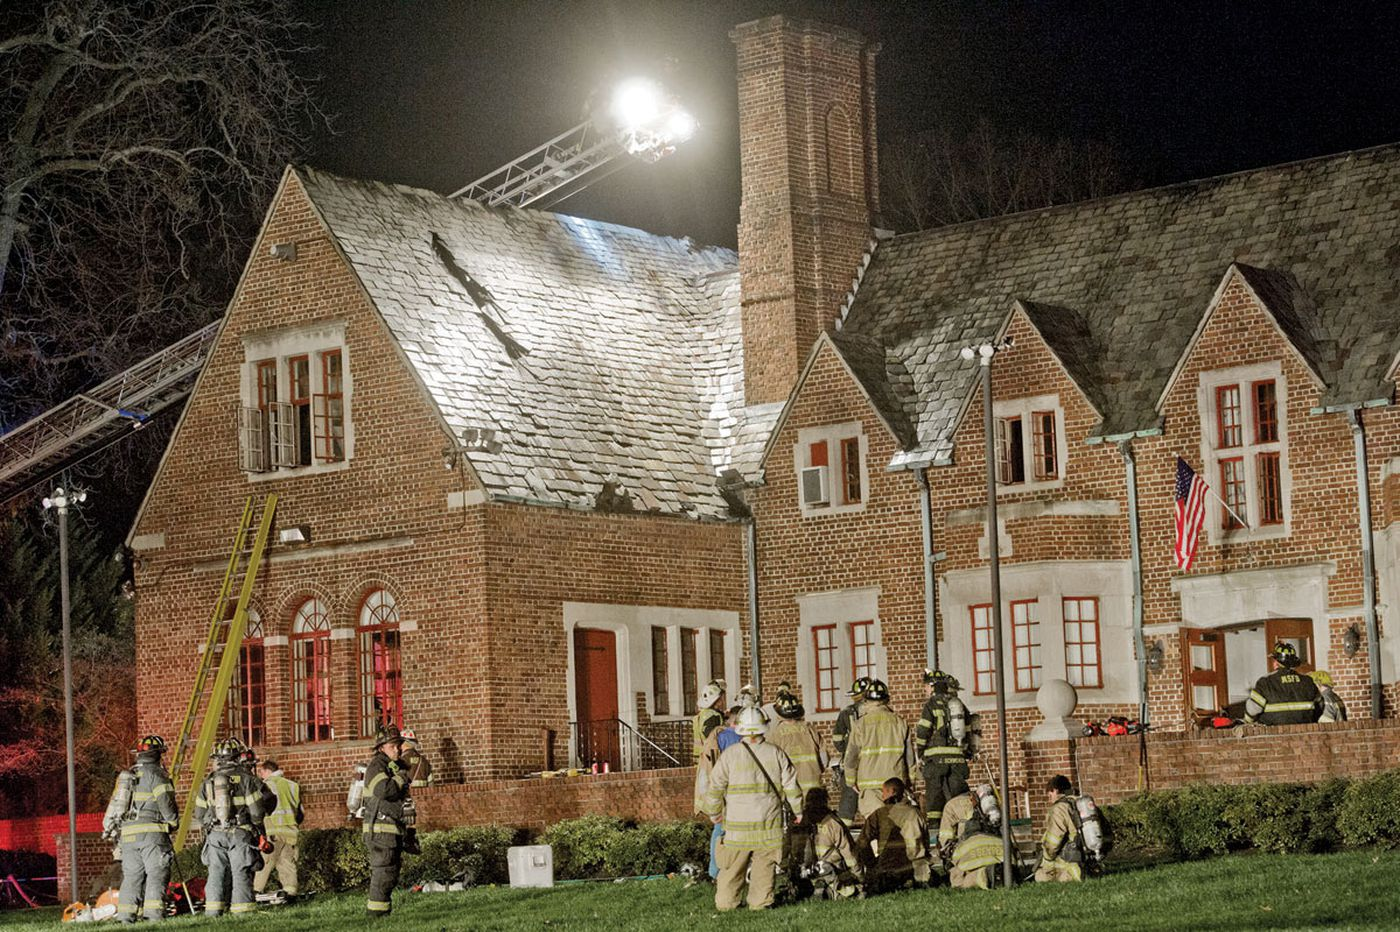 Nonprofits scramble after Moorestown Community House fire